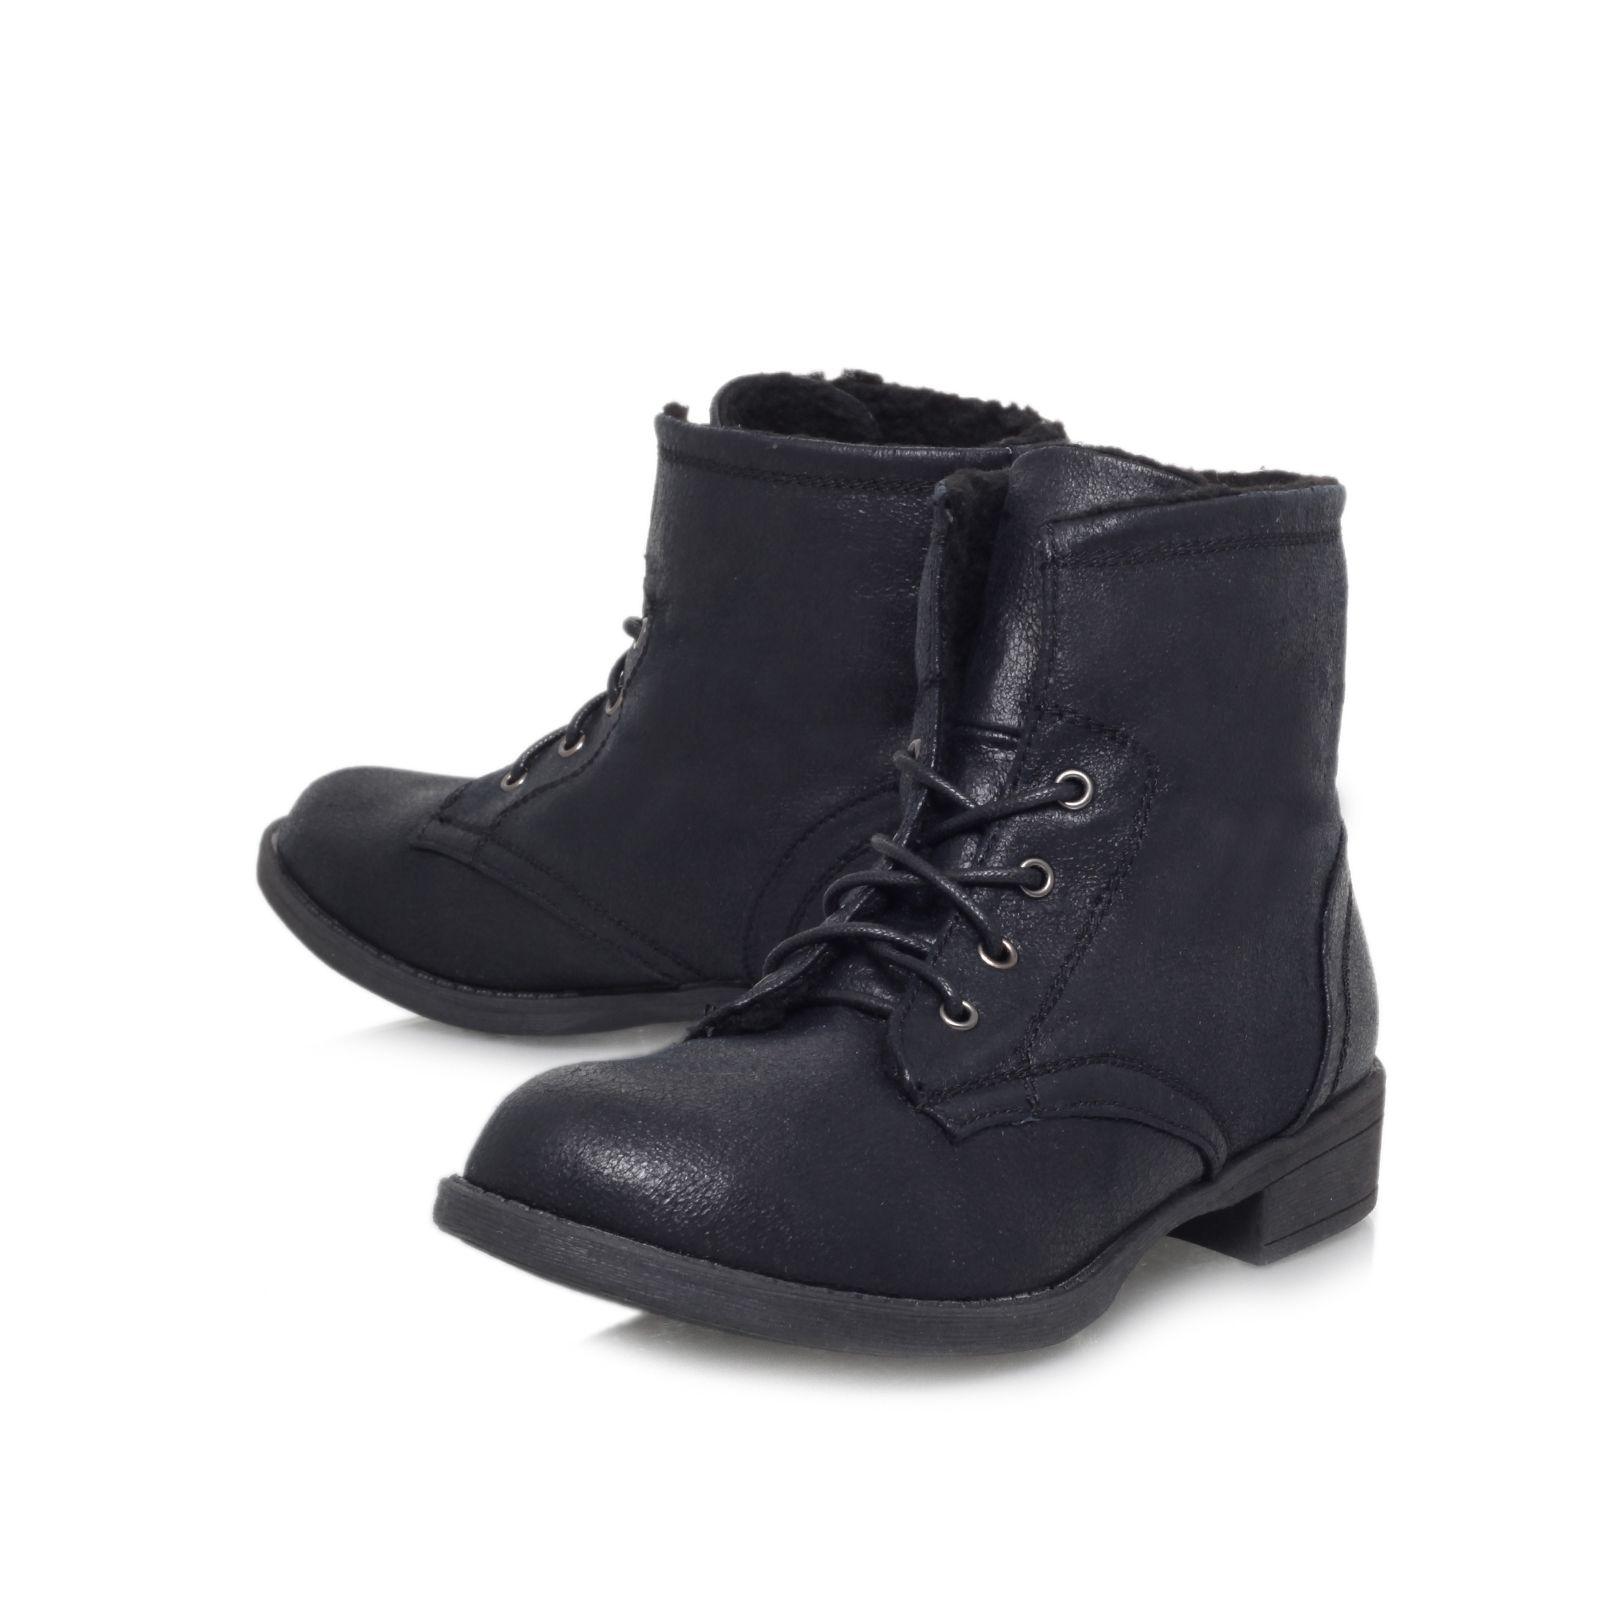 Carvela Kurt Geiger Taffy Flat Lace Up Ankle Boots in Black